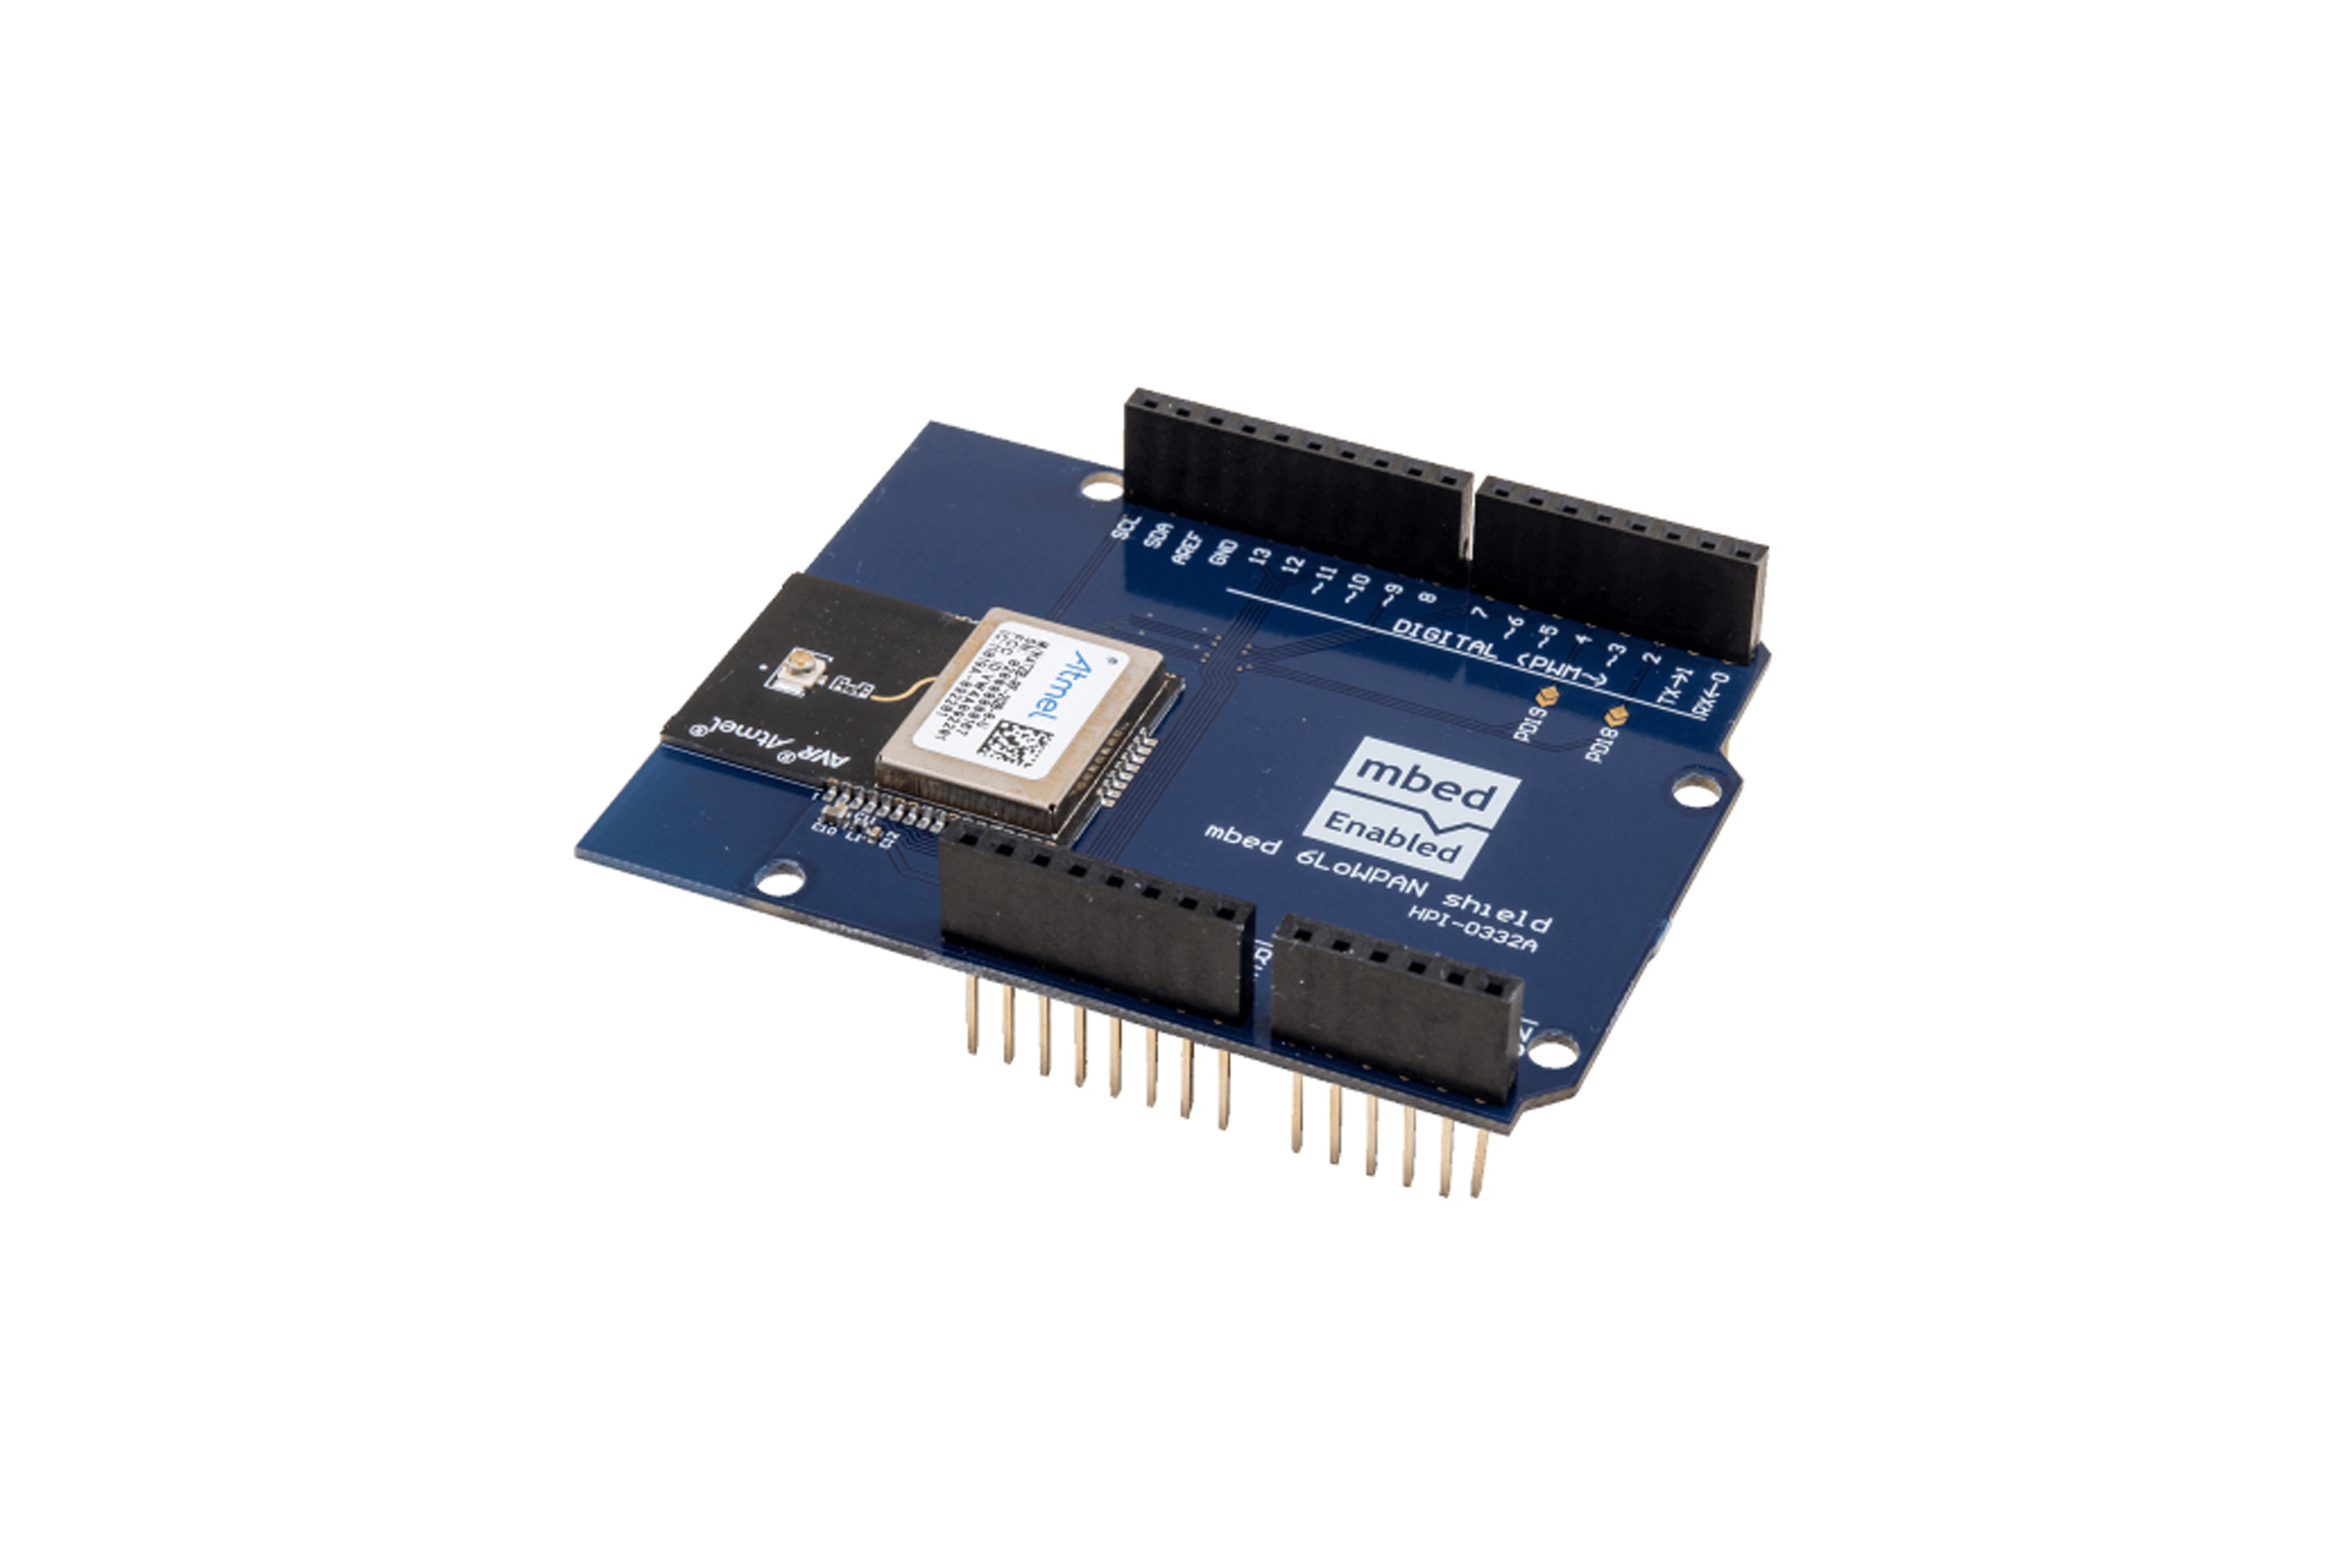 Module protec. circuit imp. Arduino 6LowPAN 2,4 GHz